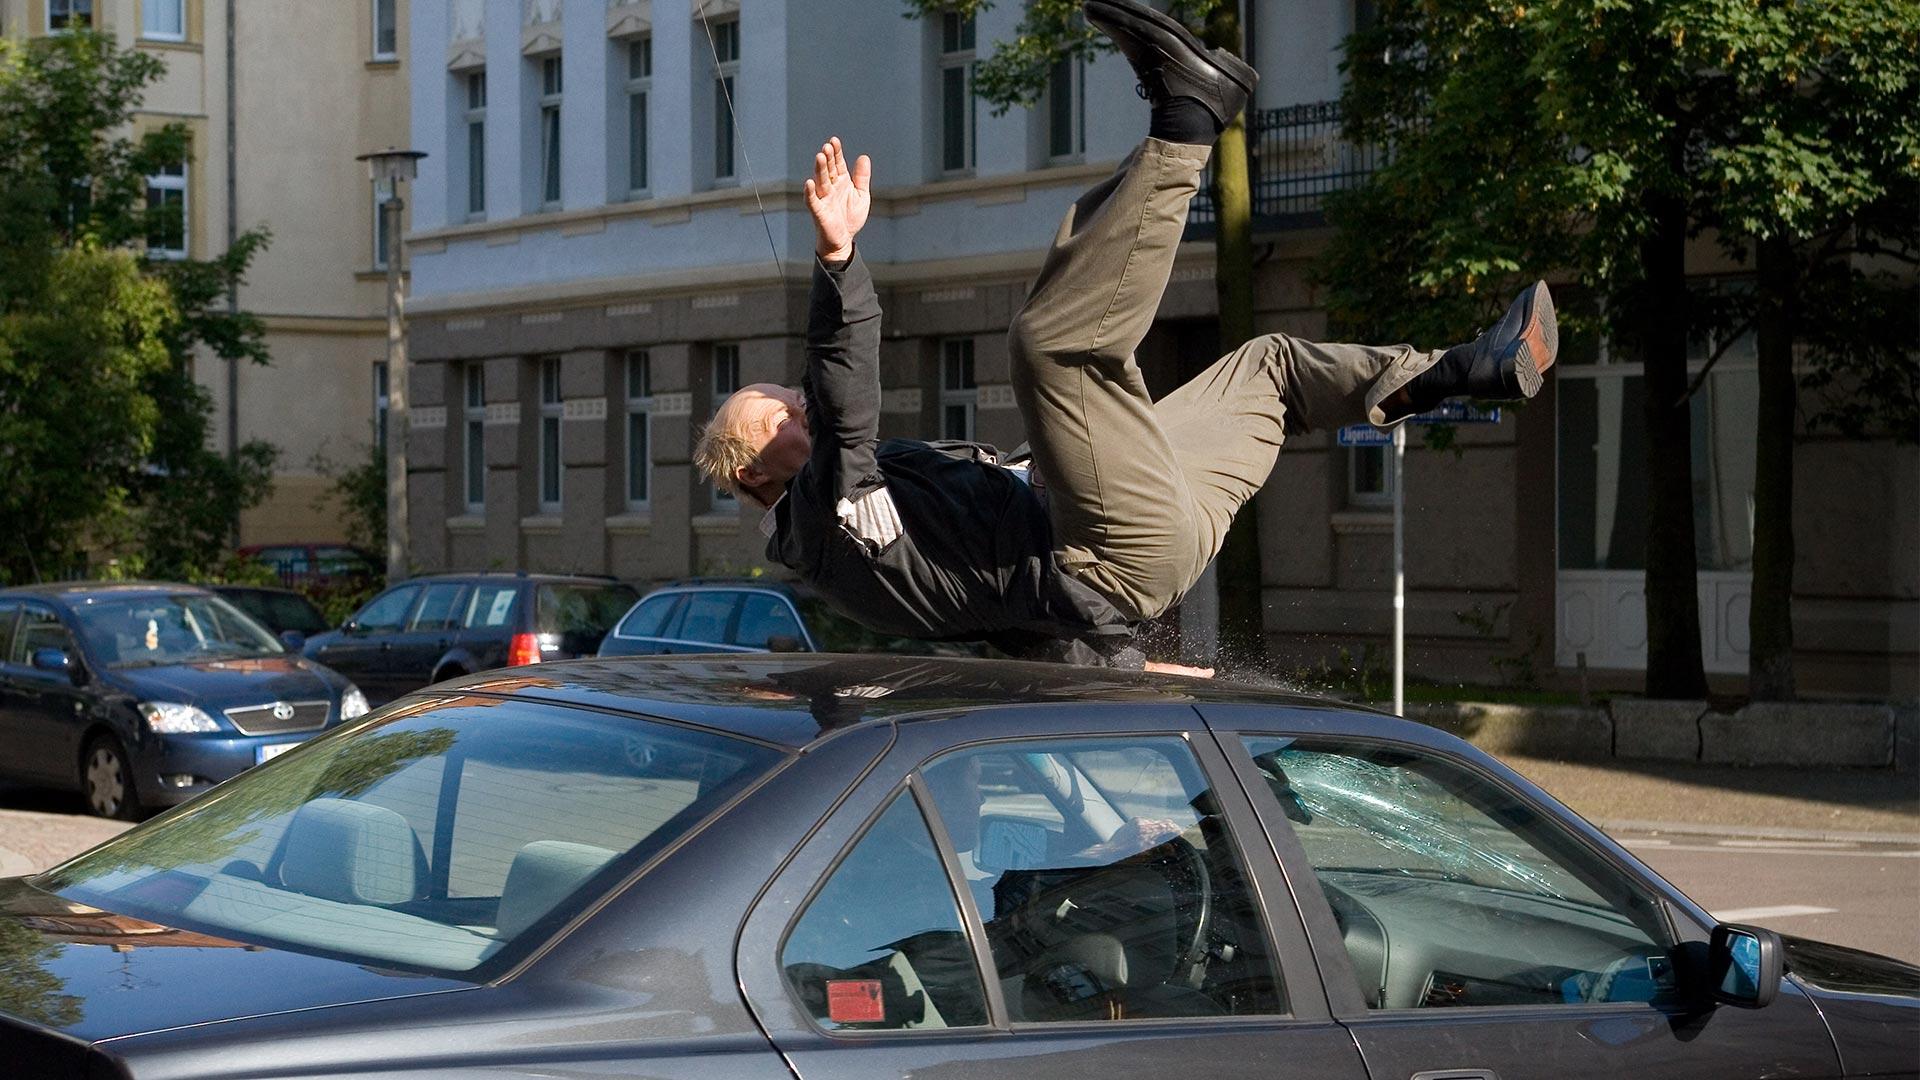 Fussgänger Frank Haberland Stunt Leipzig